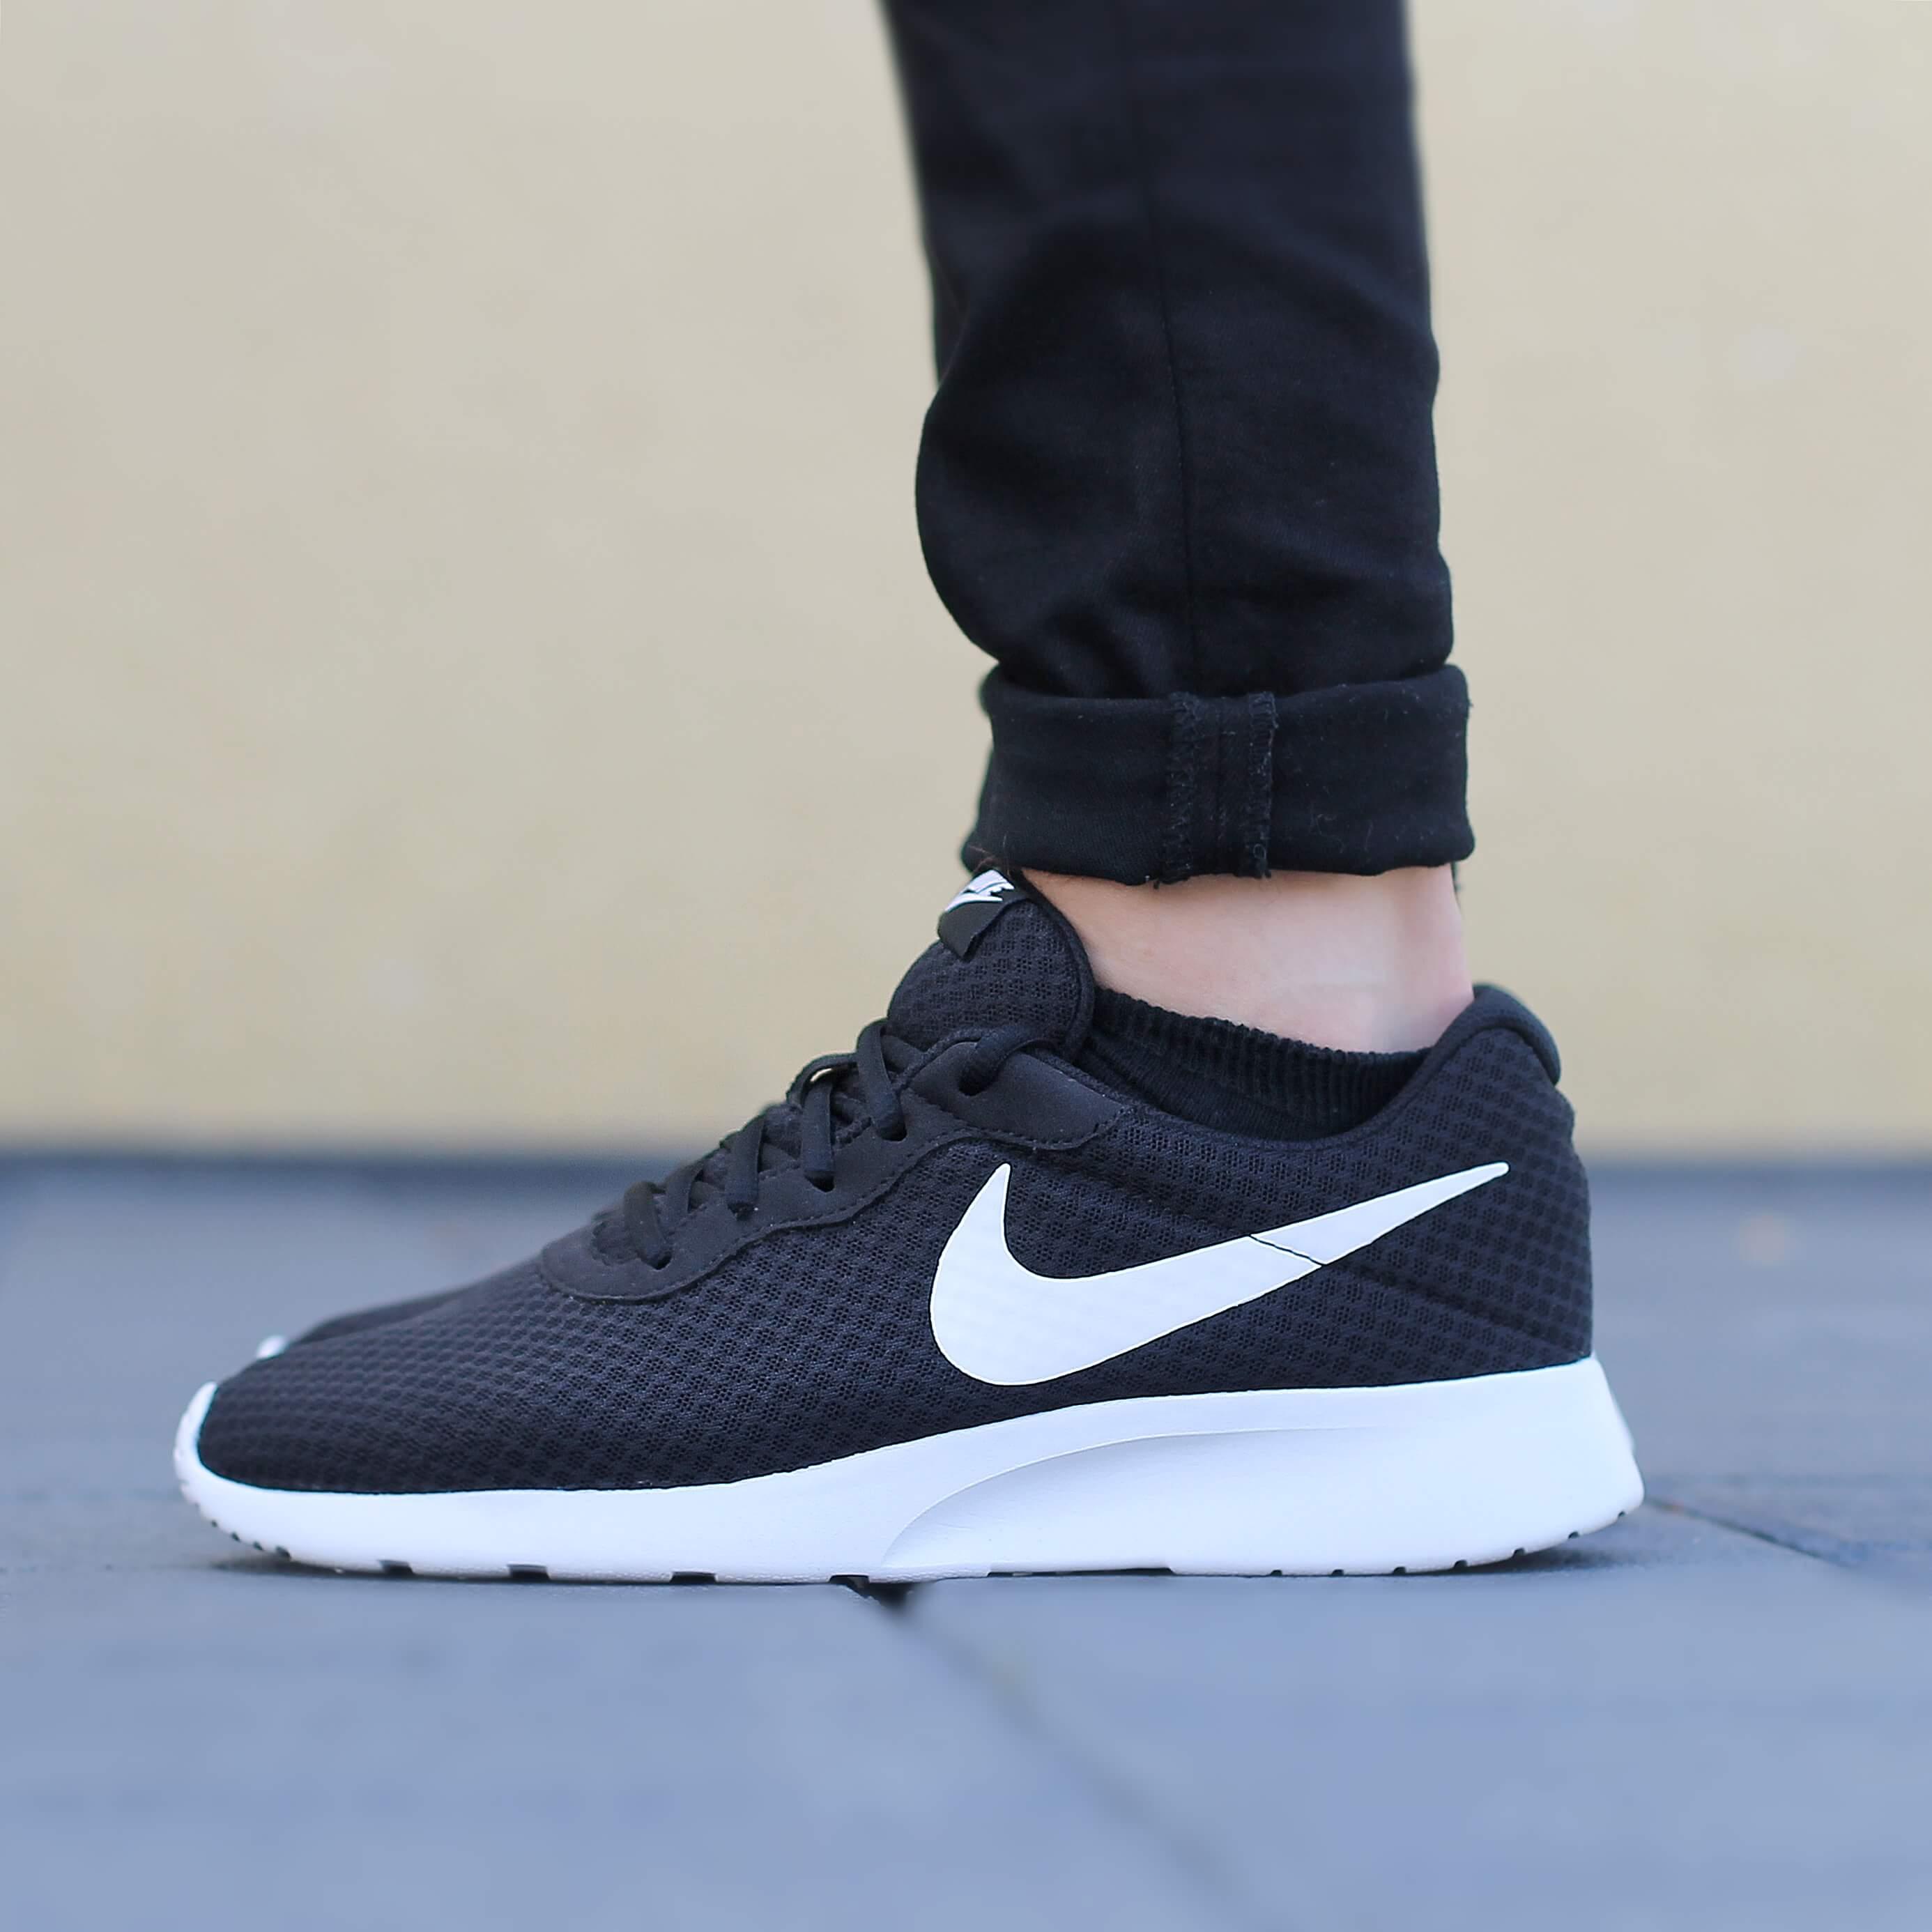 Der Nike Tanjun - Shoelove by Deichmann